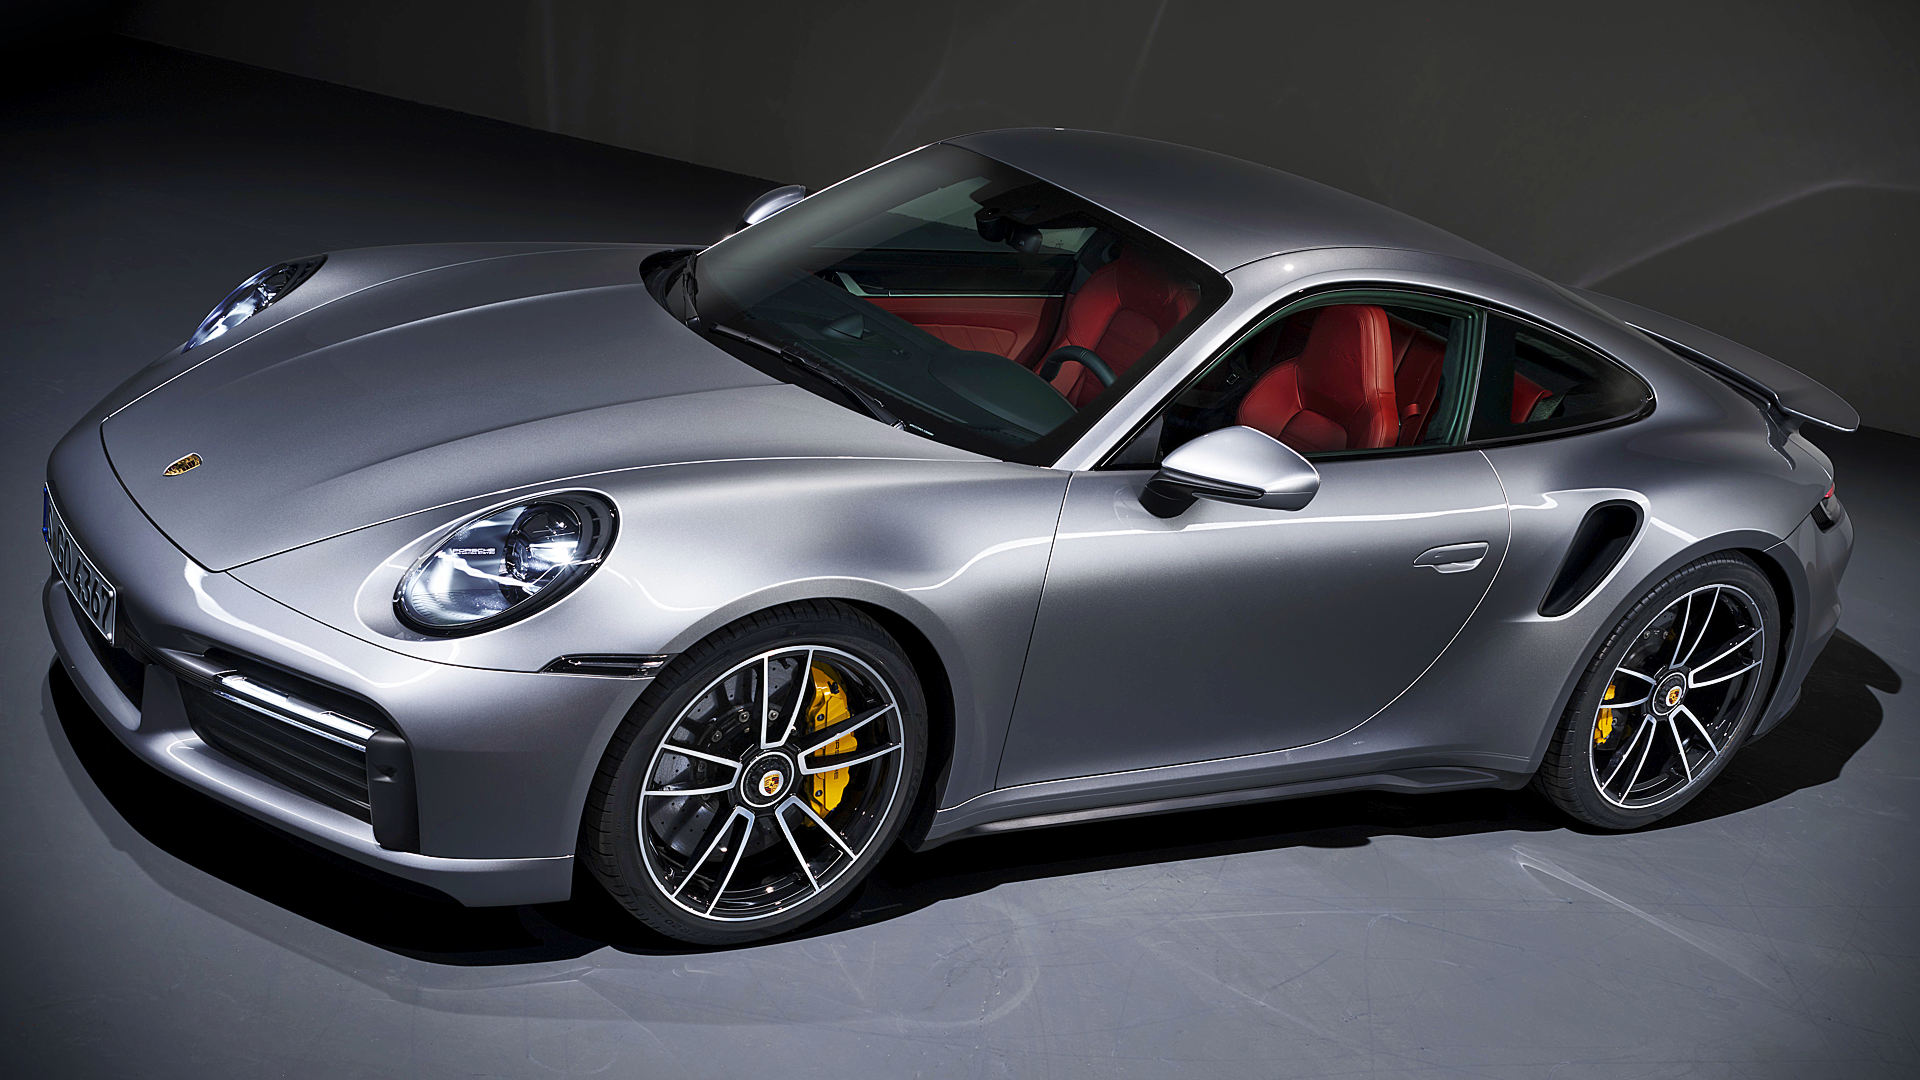 2021 Porsche 911 Turbo S Wallpaper